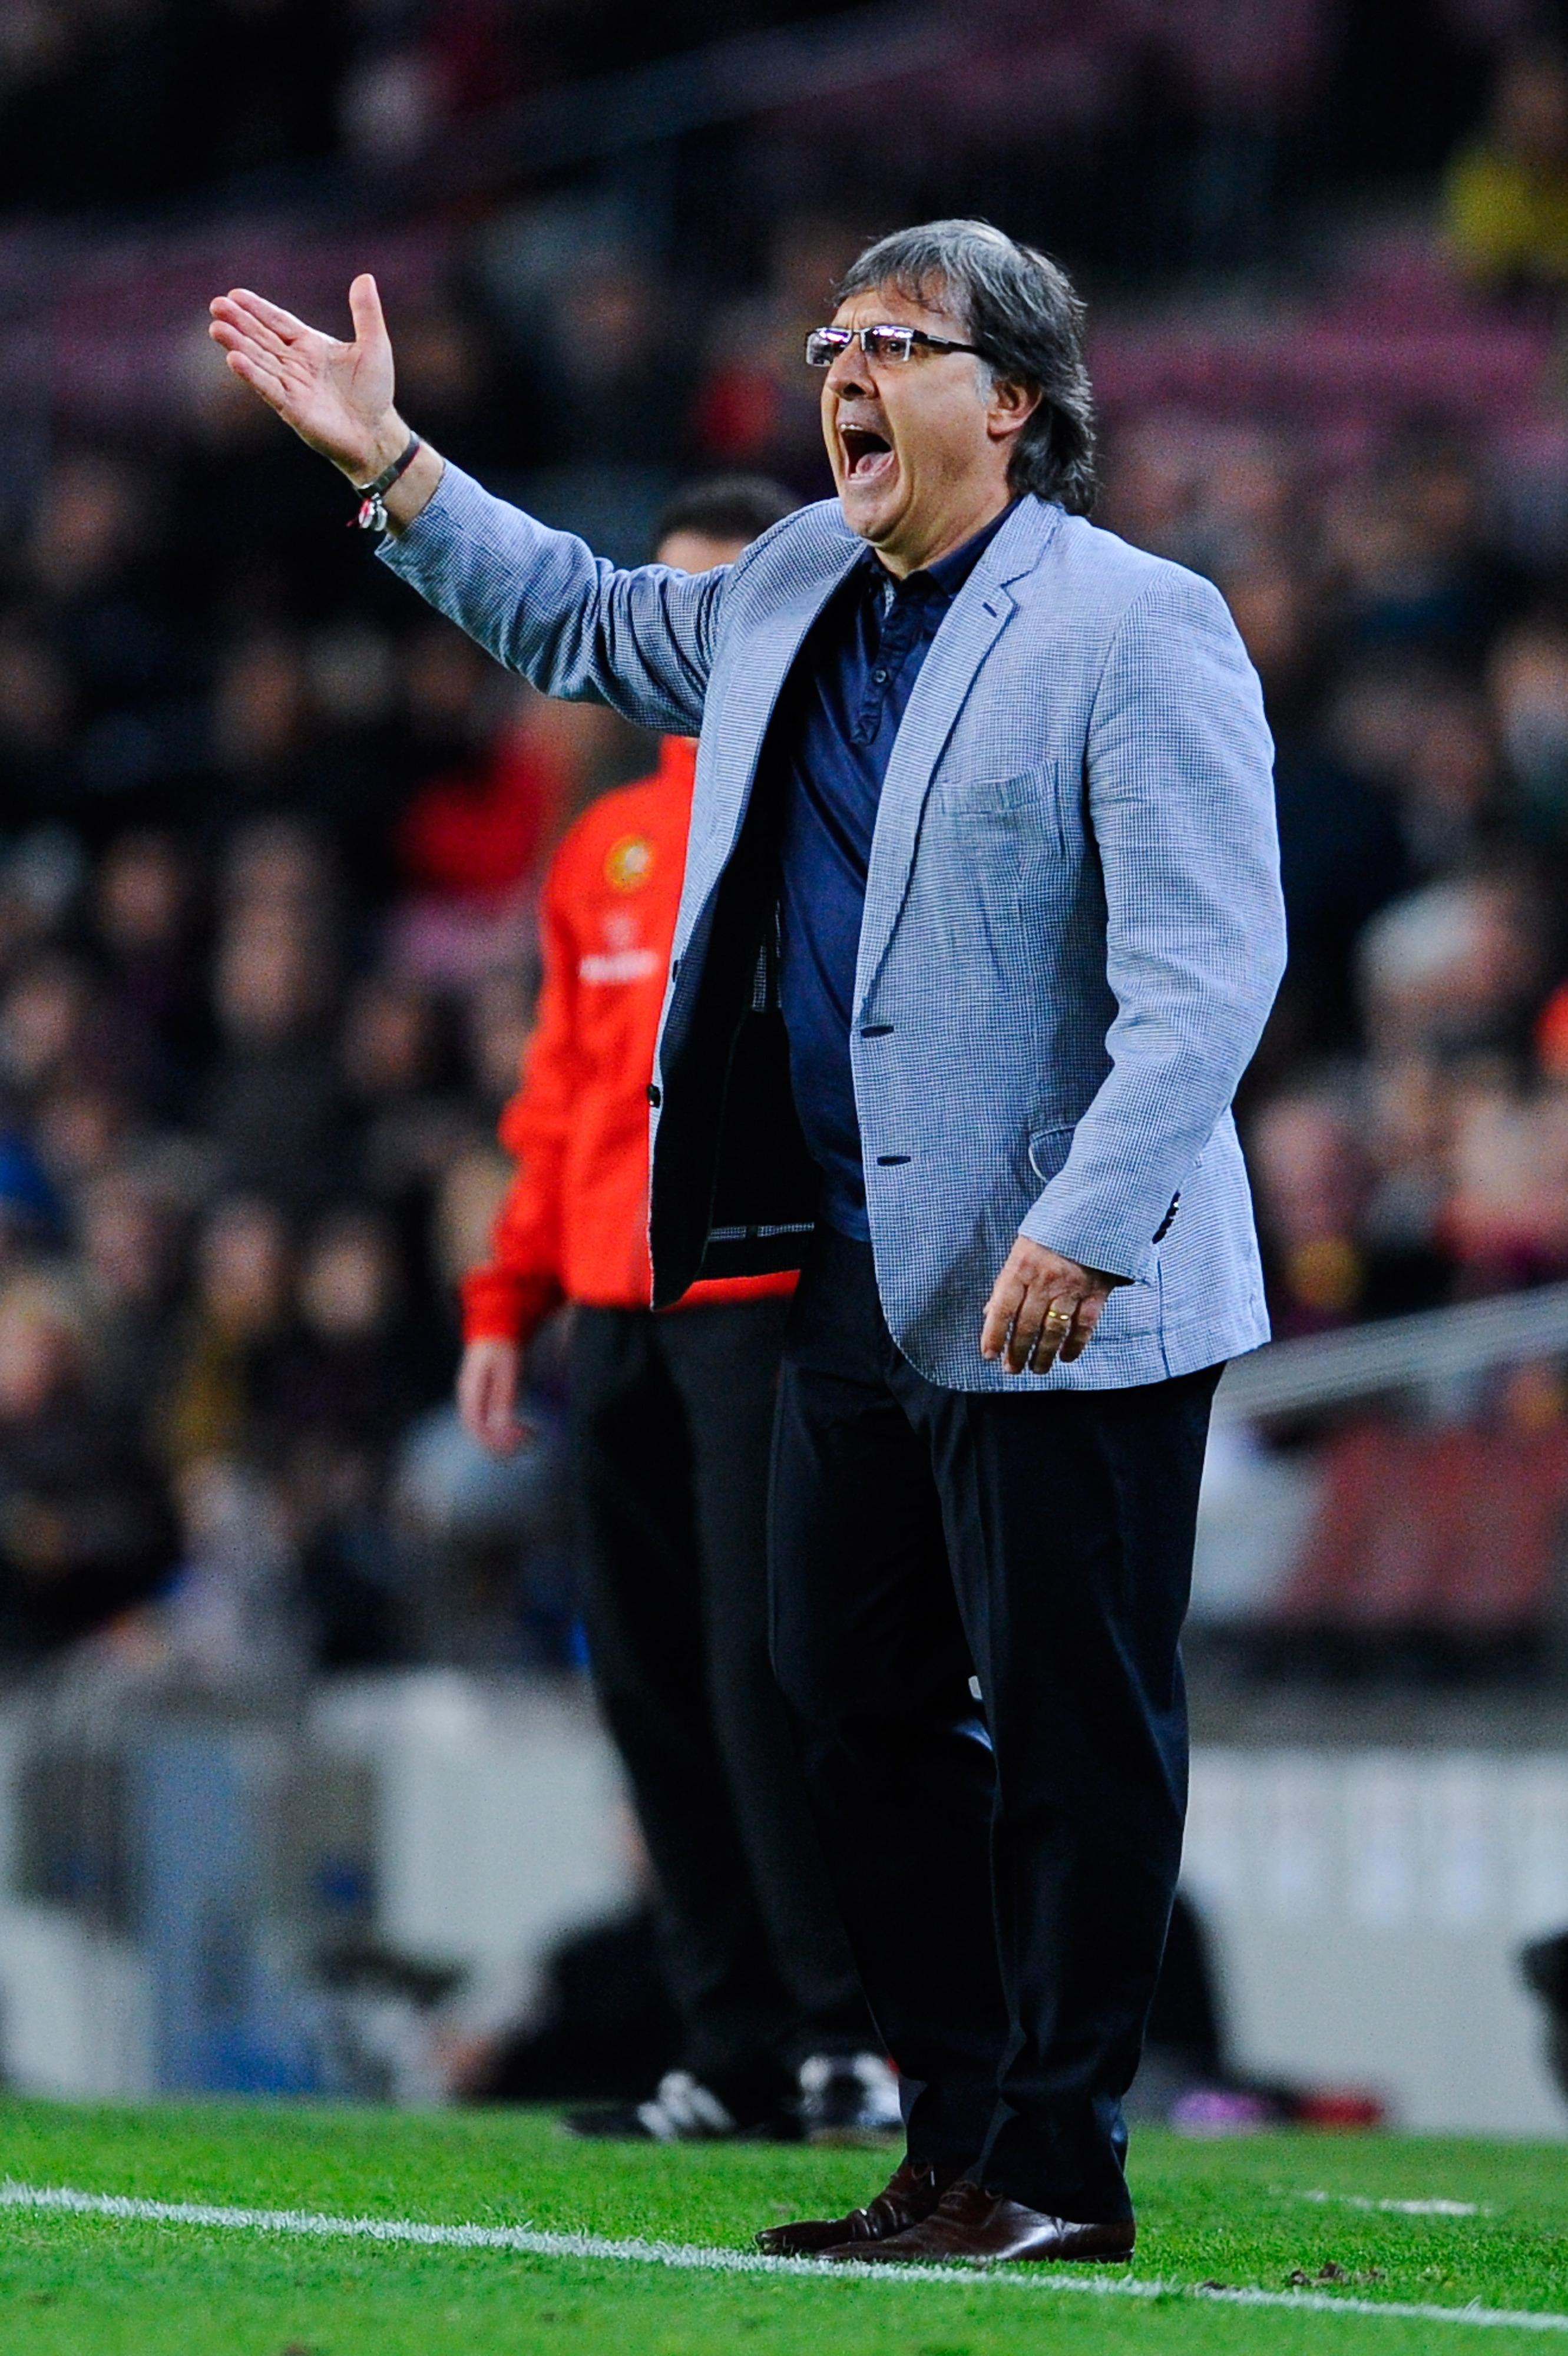 Manchester City vs. Barcelona, 2014 UEFA Champions League draw: Barca face tough test in resurgent City